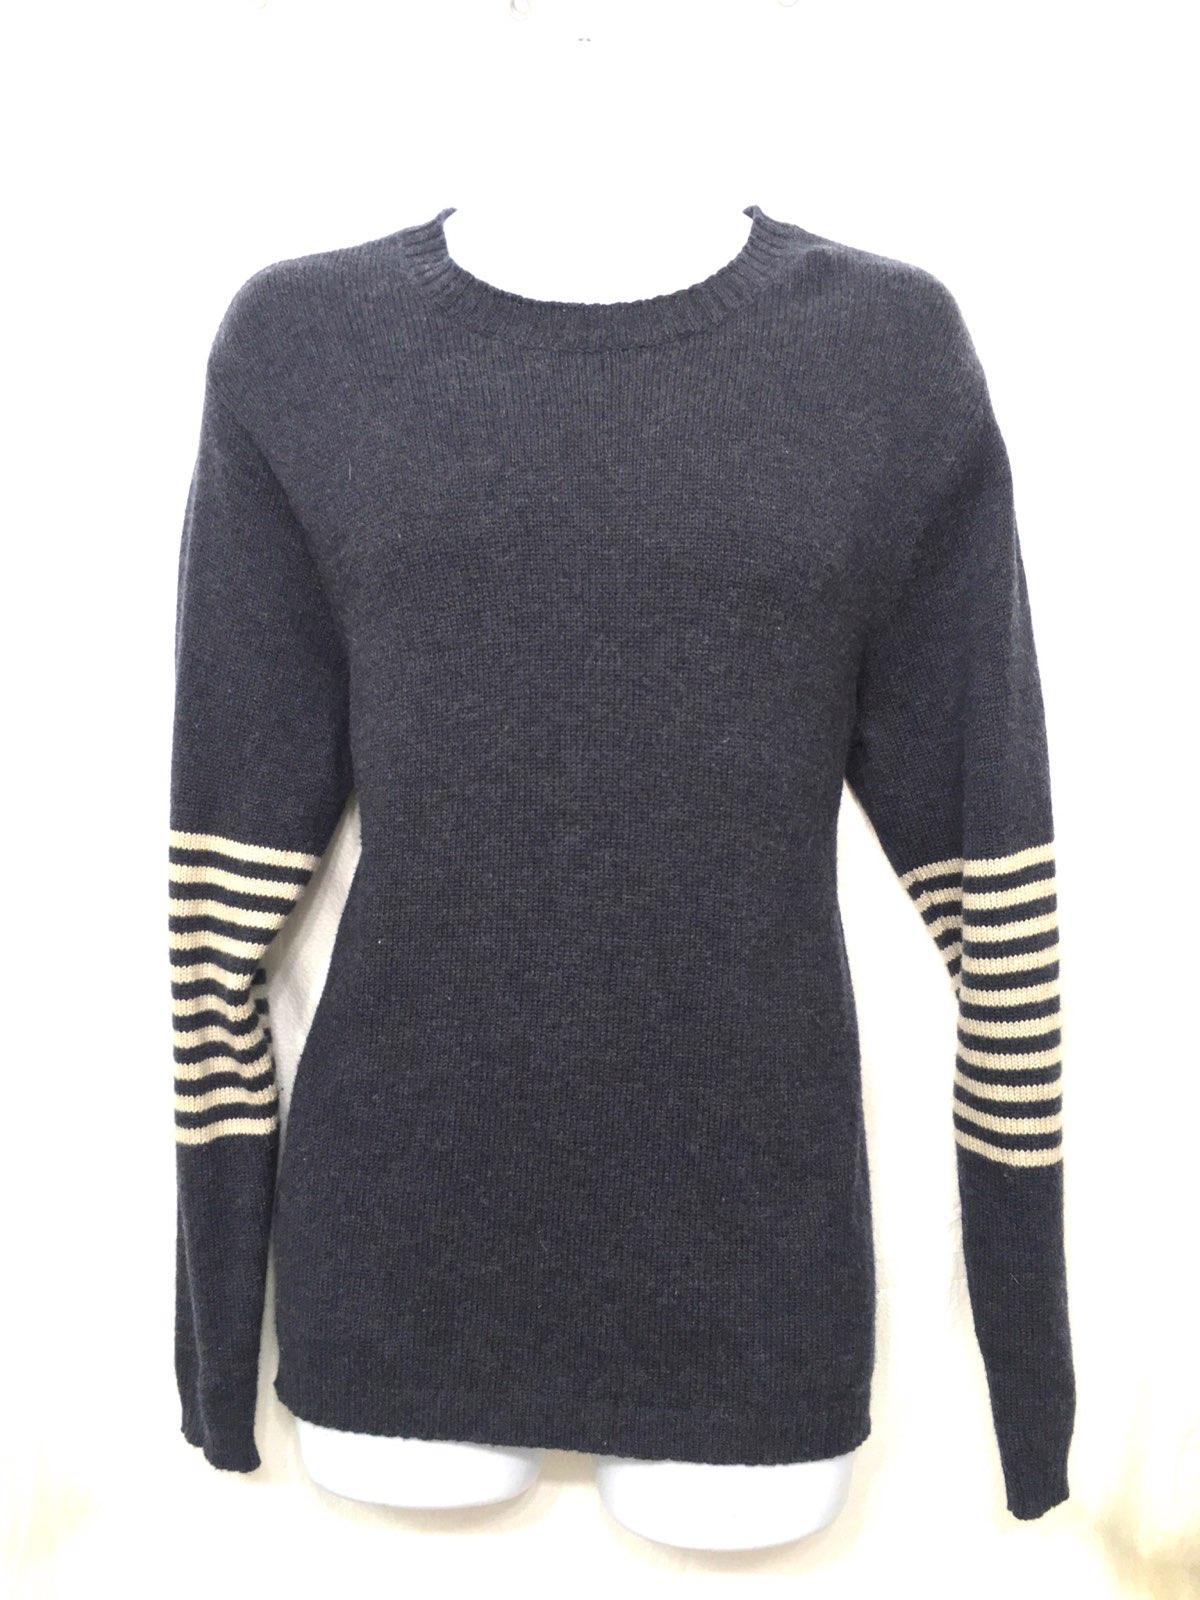 Patagonia Men's Navy Blue Wool Sweater - Mercari: BUY & SELL ...